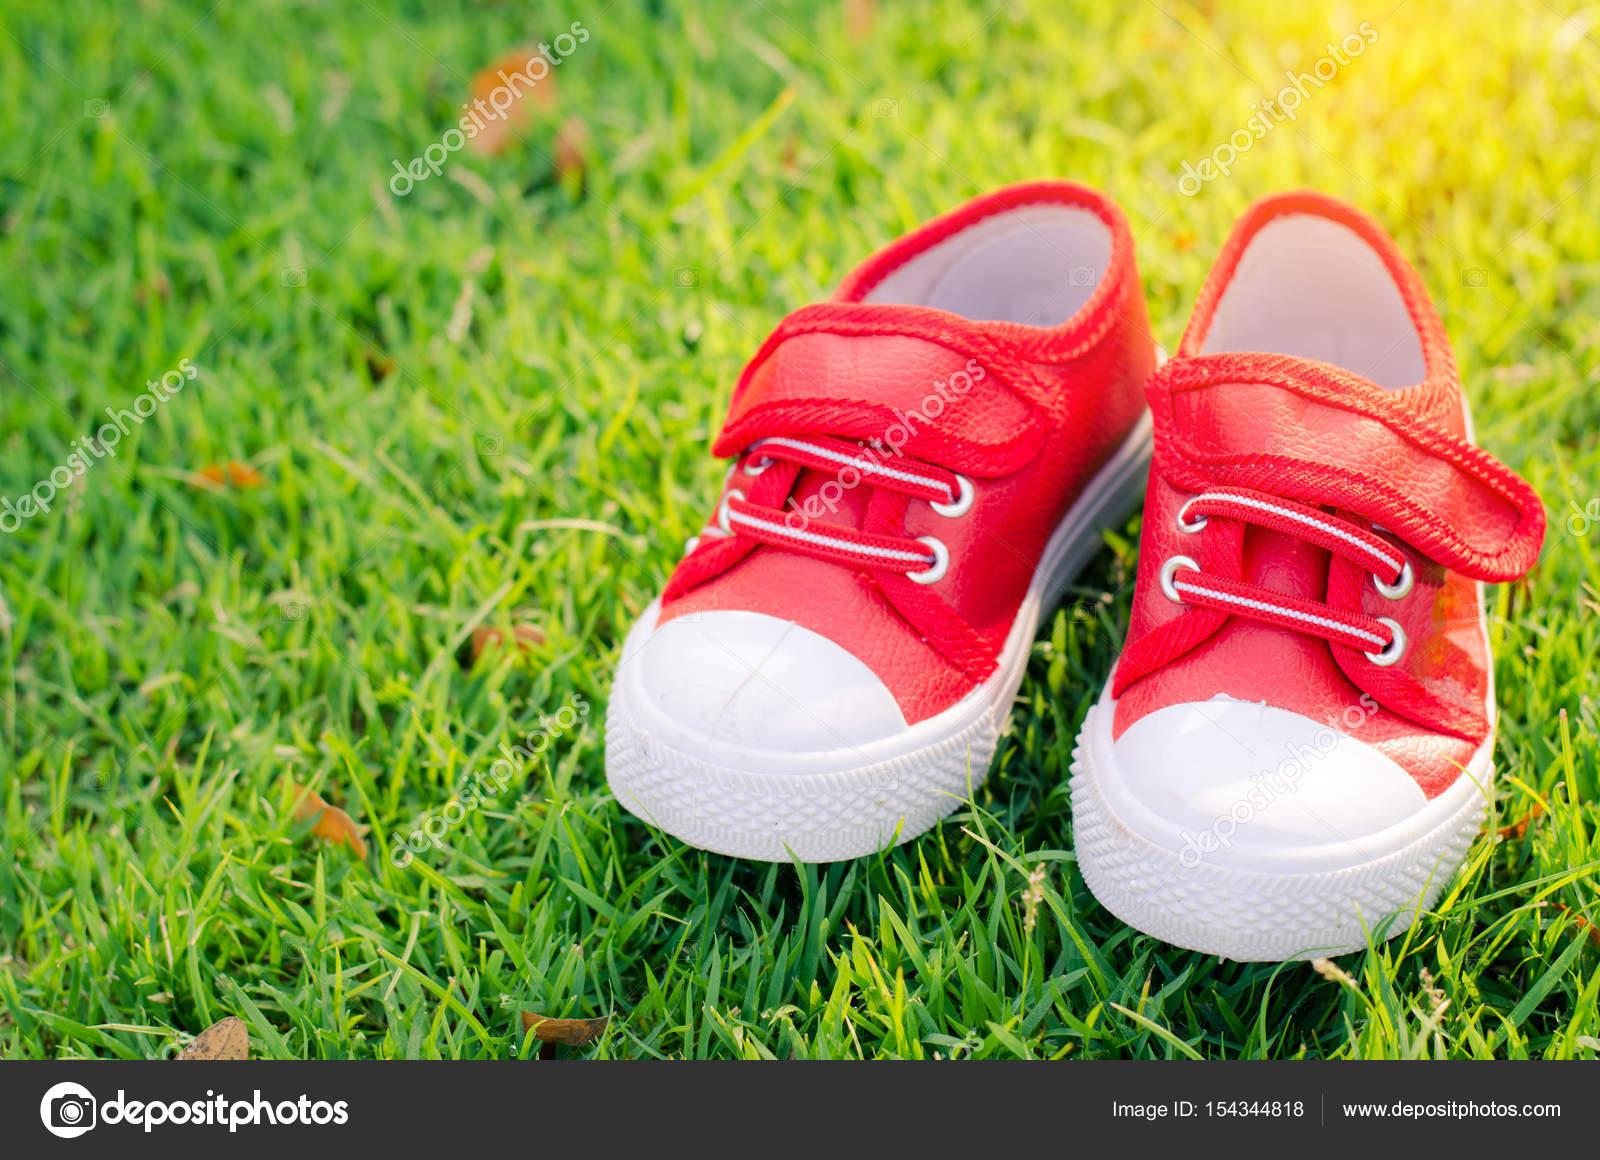 Rote Schuhe Fur Kinder Am Grunen Rasen Boden Stockfoto